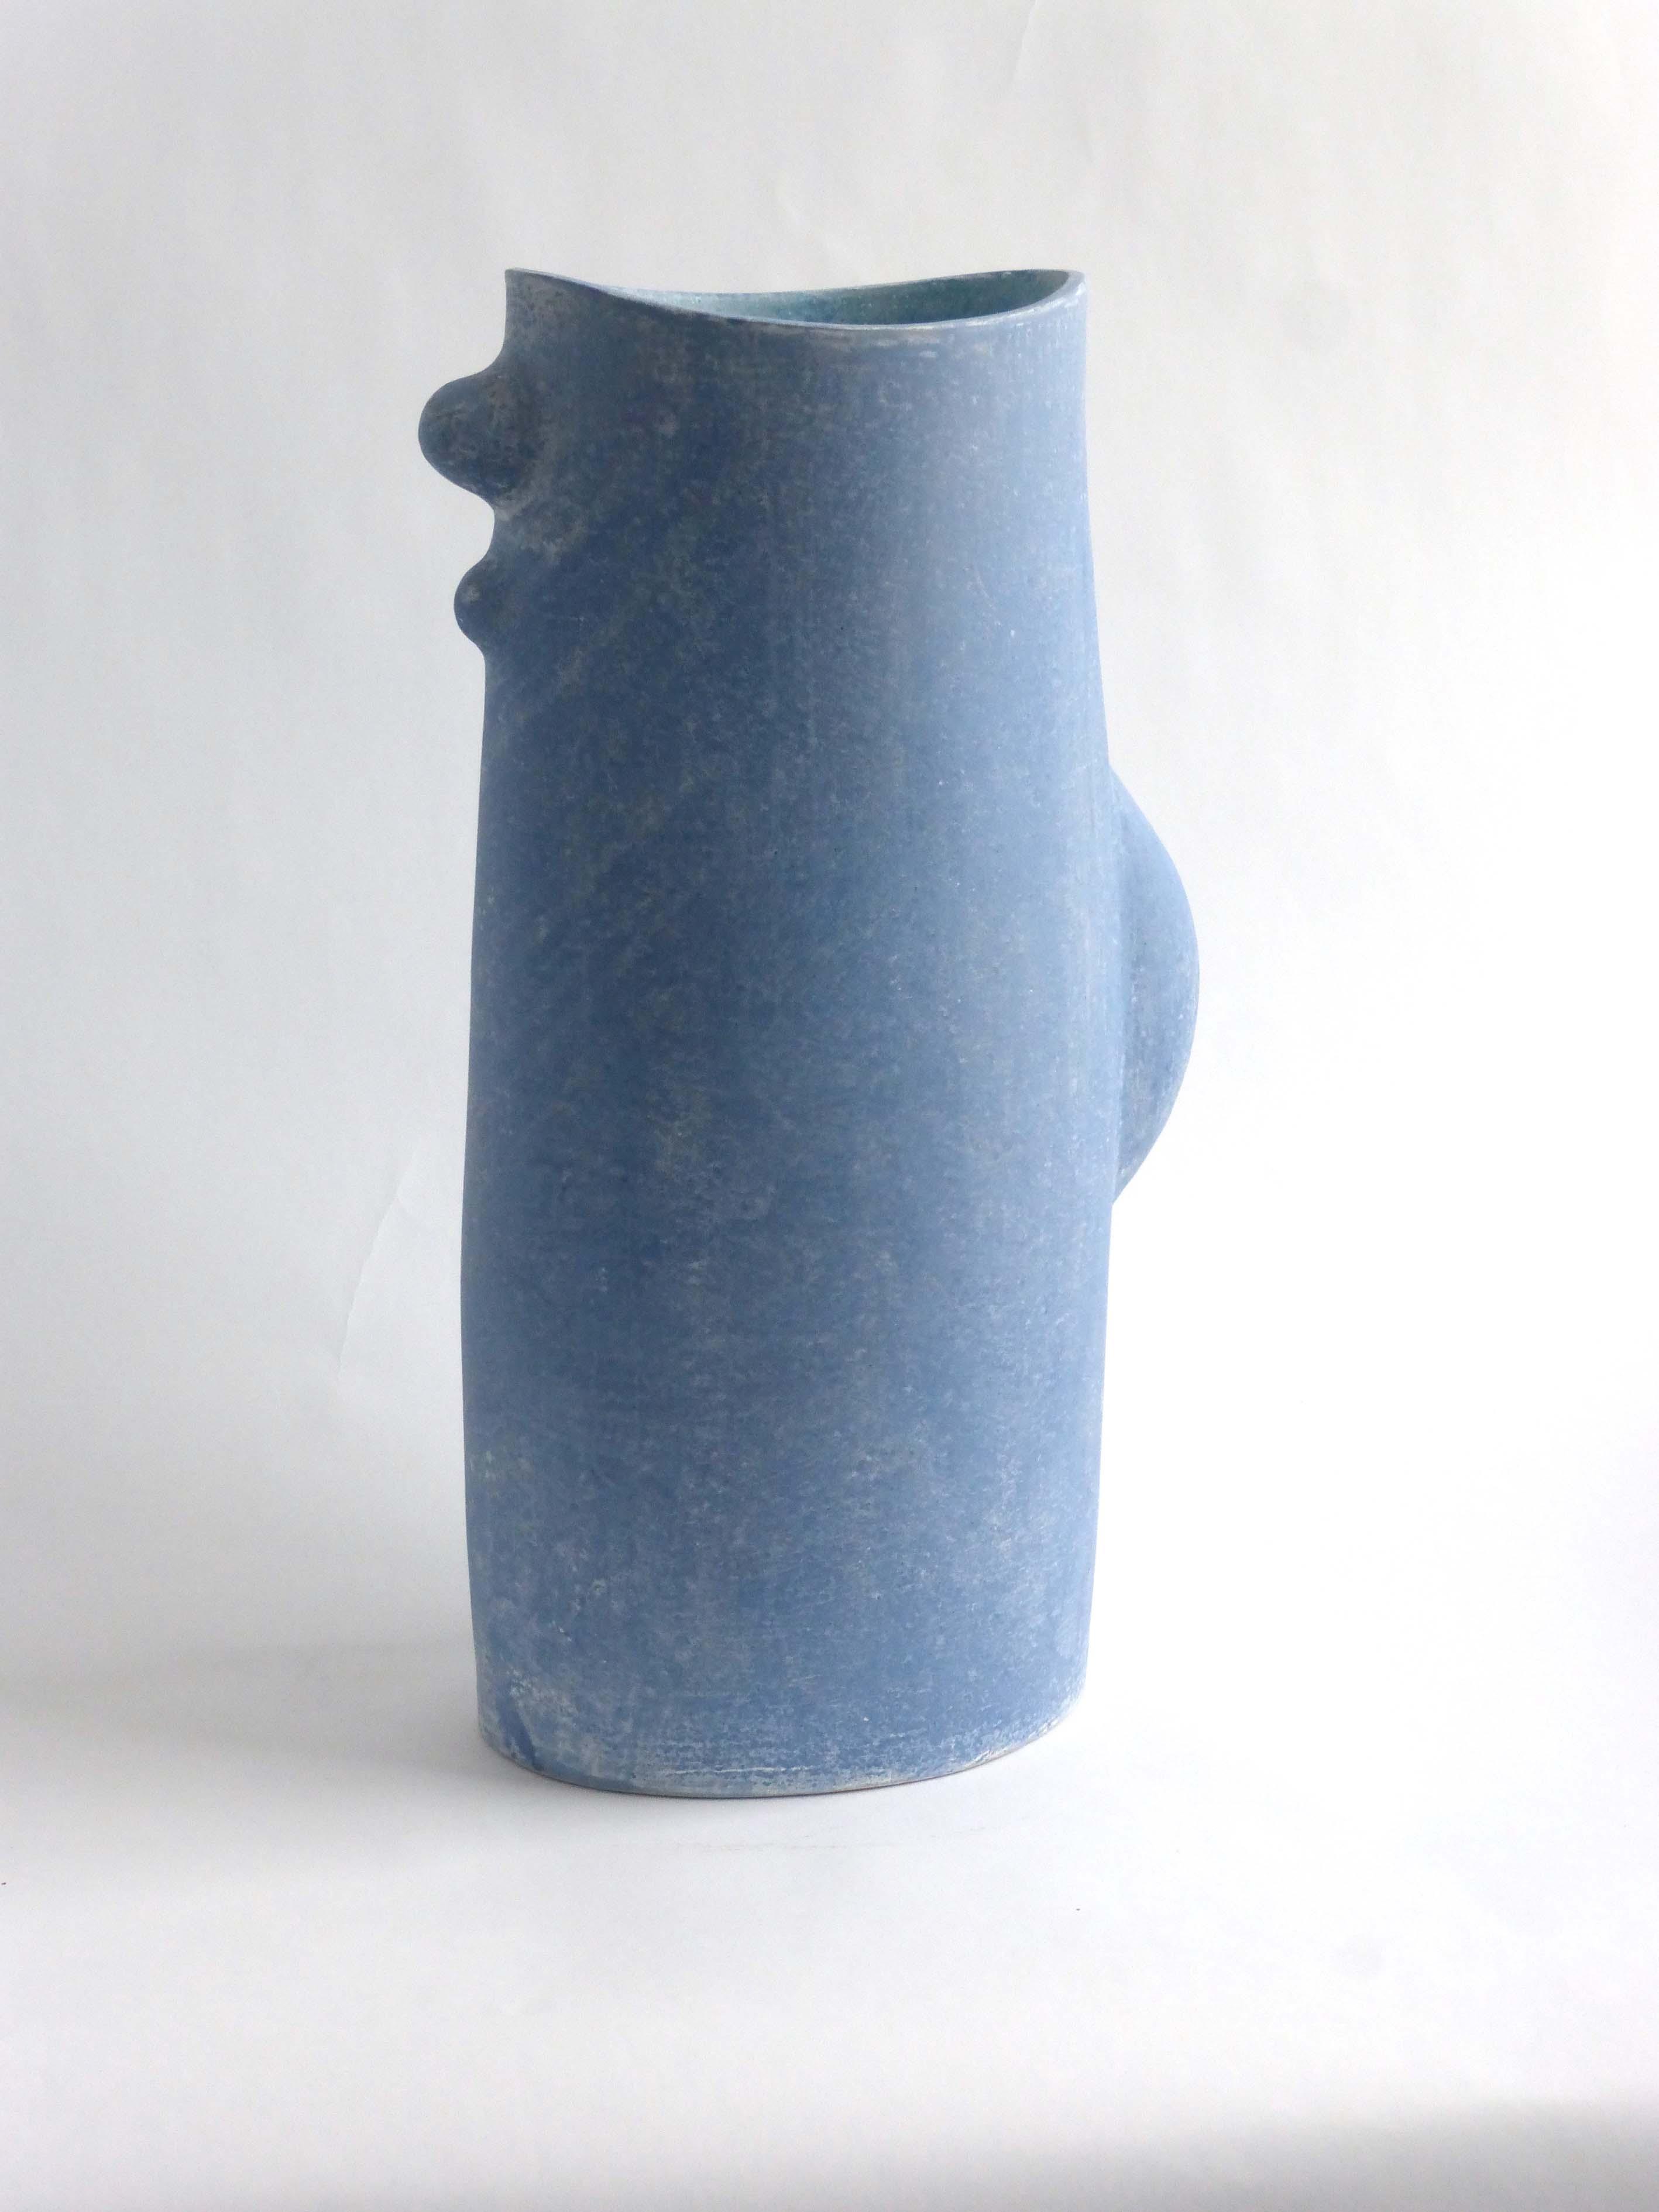 Mike Byrne, Undulate, fired clay, 2014, 43 x 21 x 16cm, EUR 500